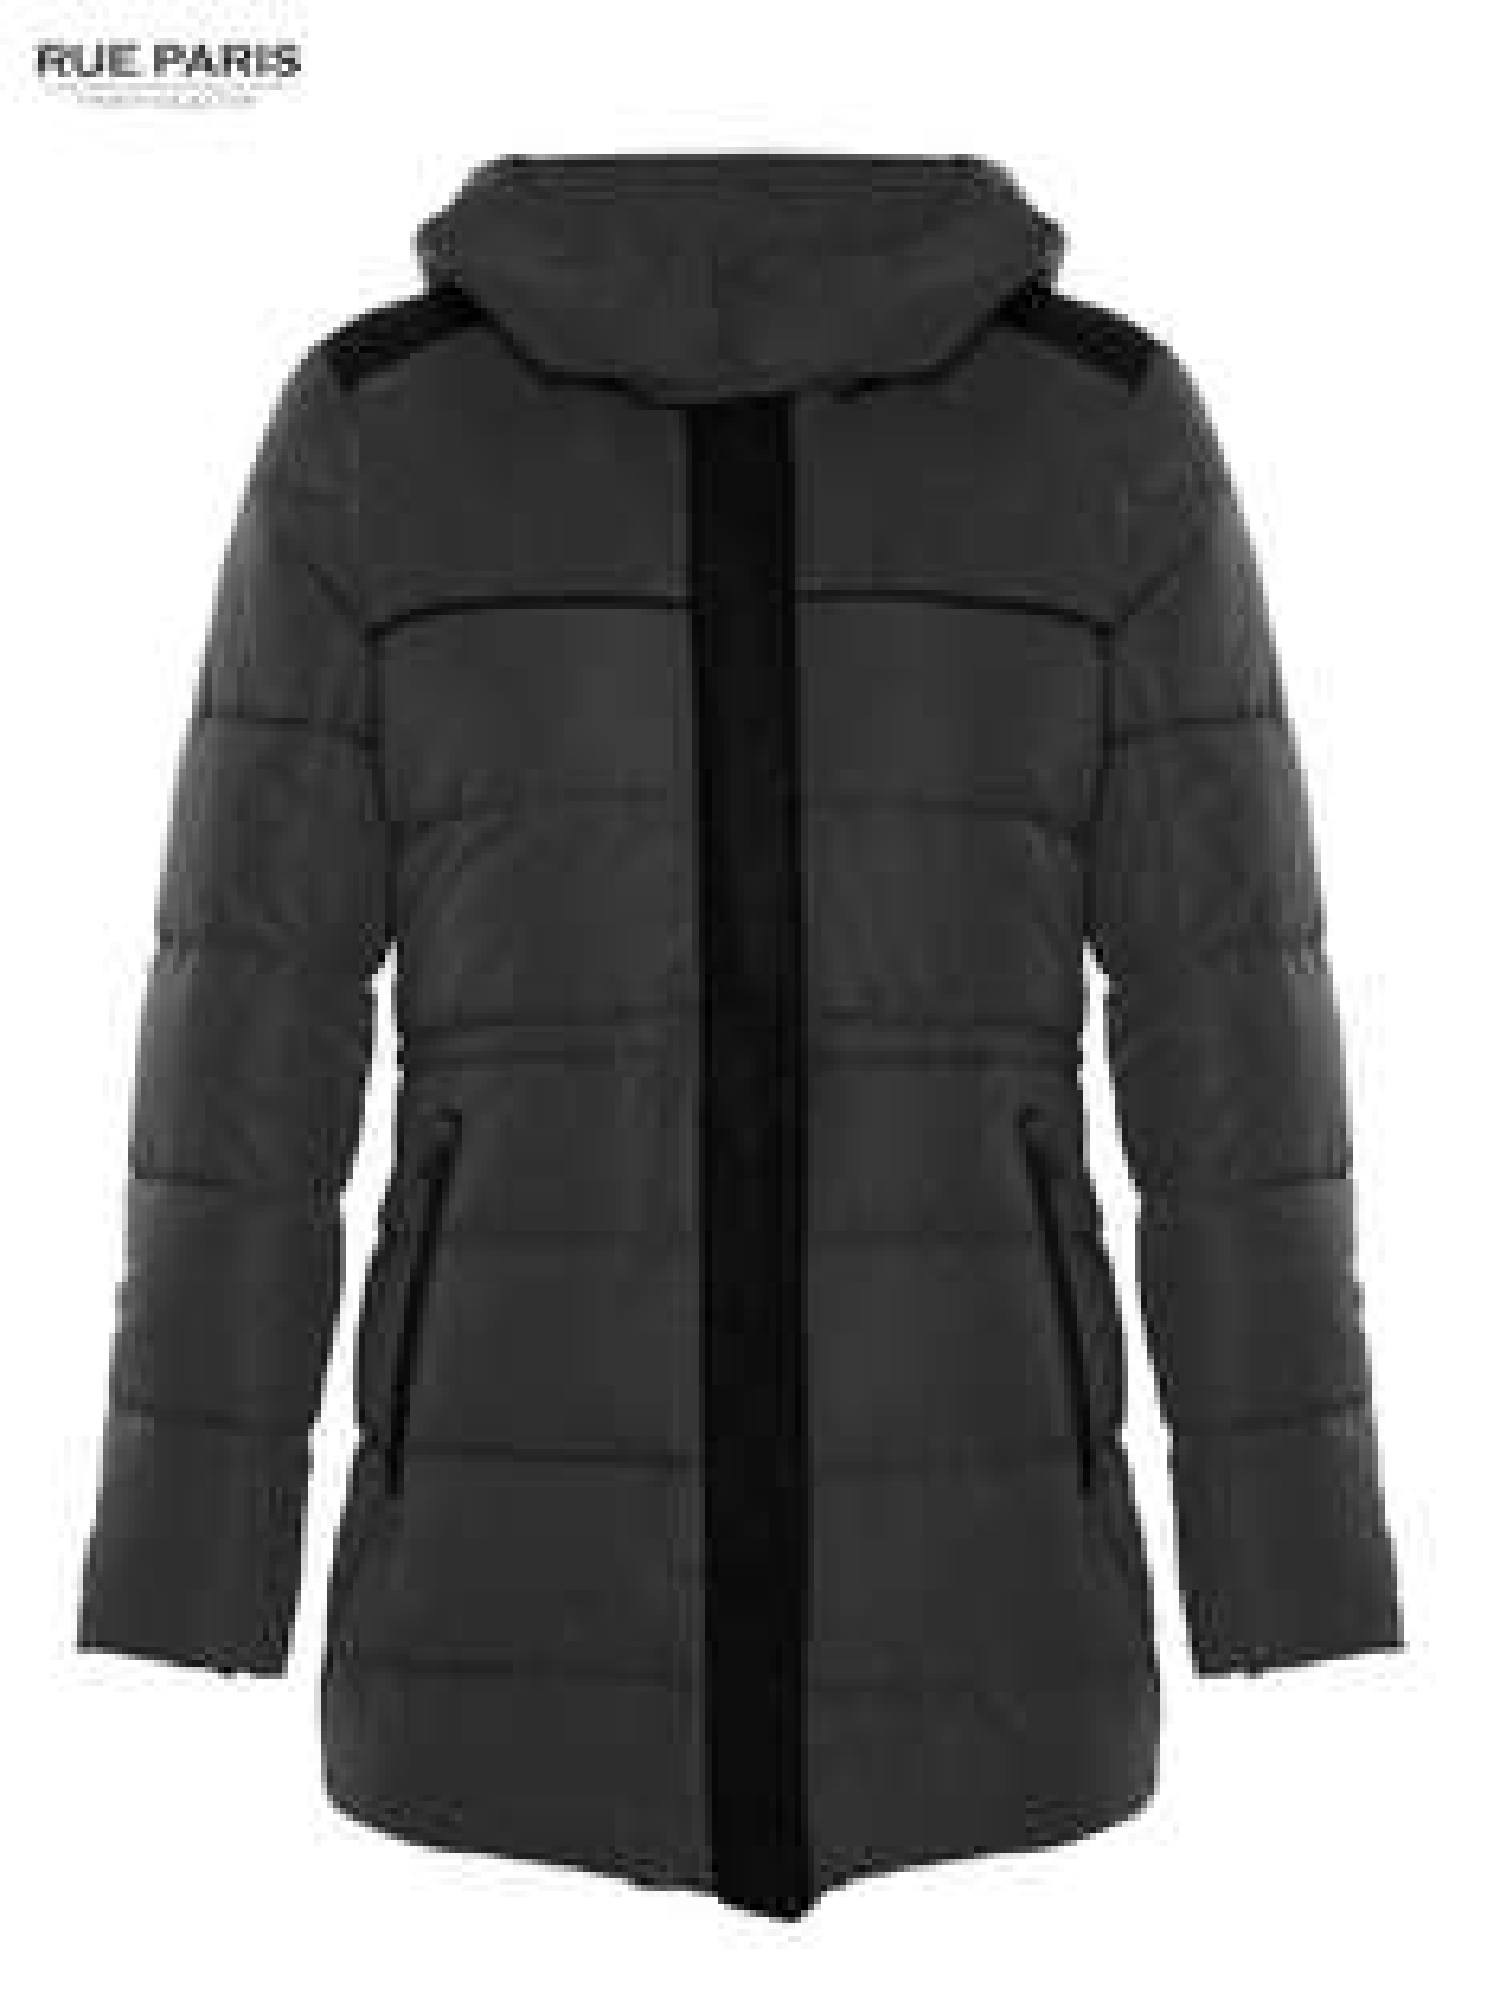 Damska puchowa kurtka za 99,90zł (70% taniej!!) @ Butik